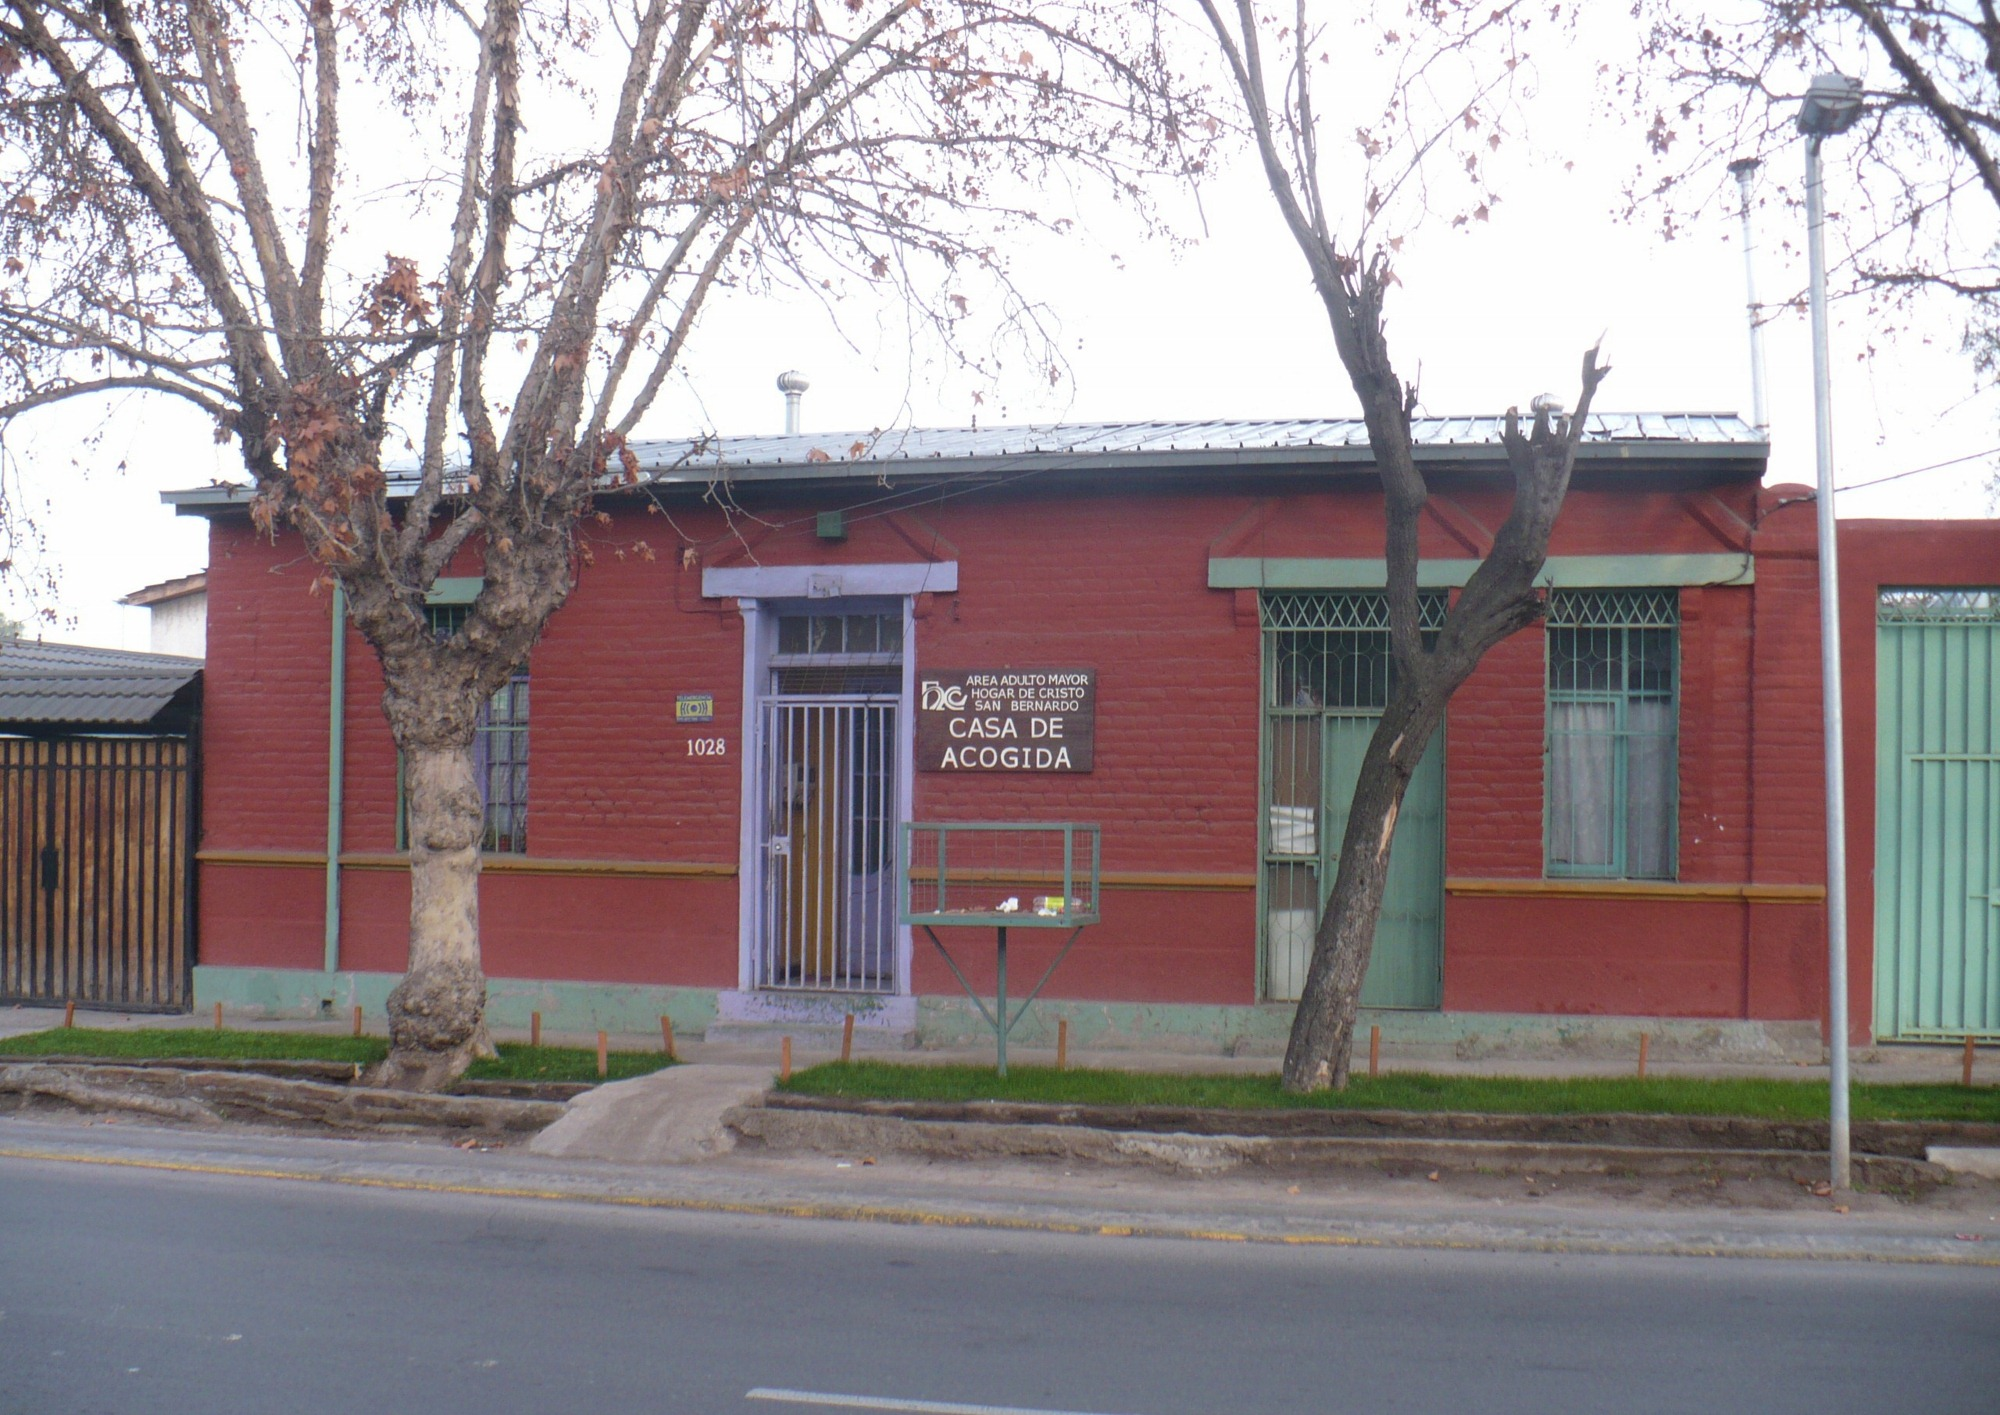 Casa de acogida del hogar de cristo santiago de chile for Decoracion hogar santiago chile